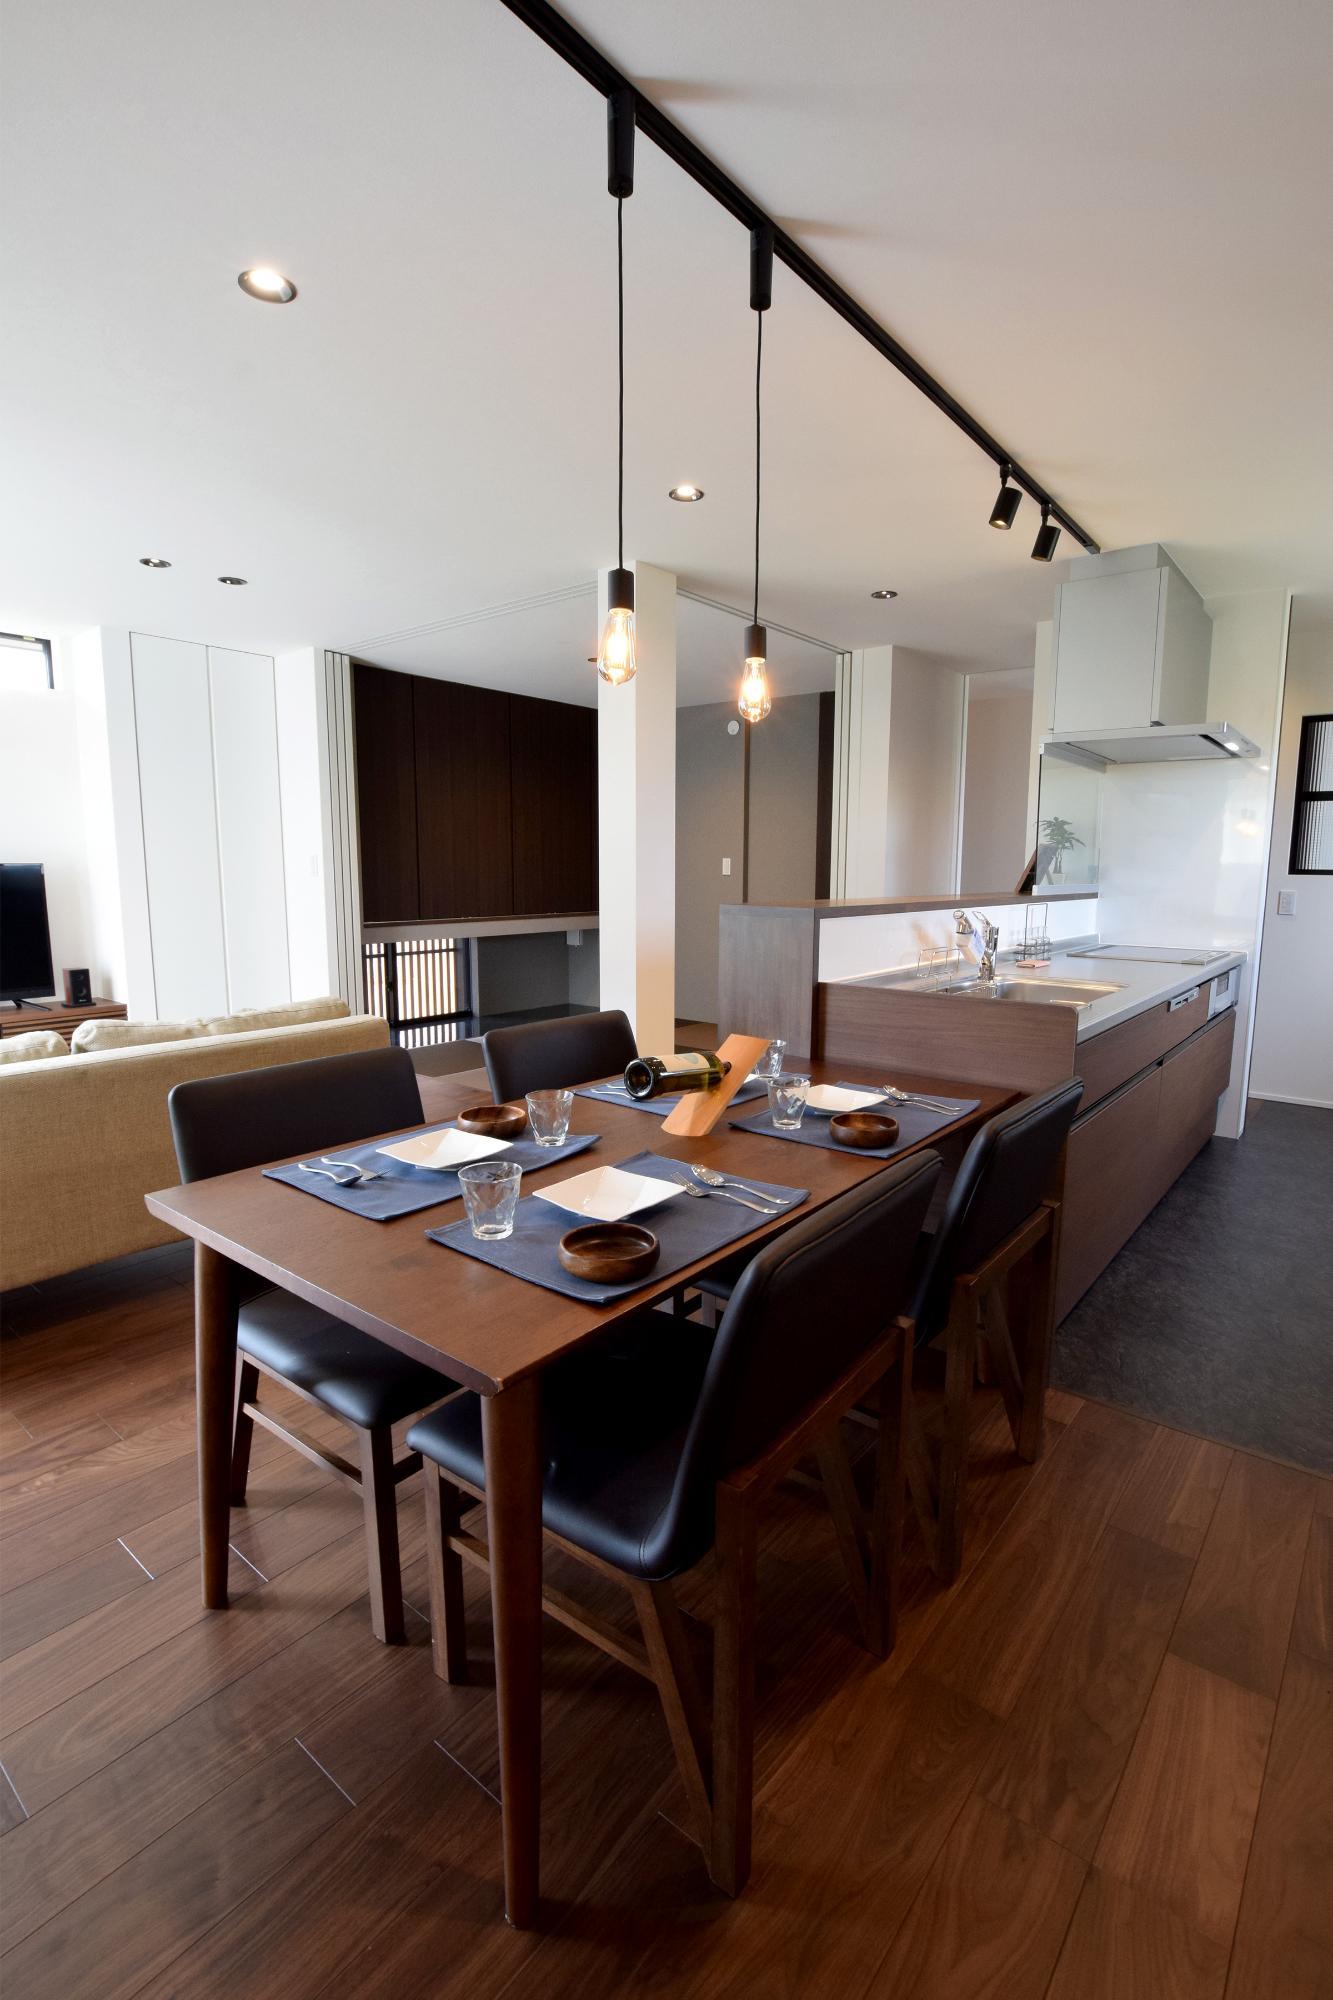 DETAIL HOME(ディテールホーム)「充実収納のスタイリッシュハウス」のモダン・和風・和モダンなキッチンの実例写真